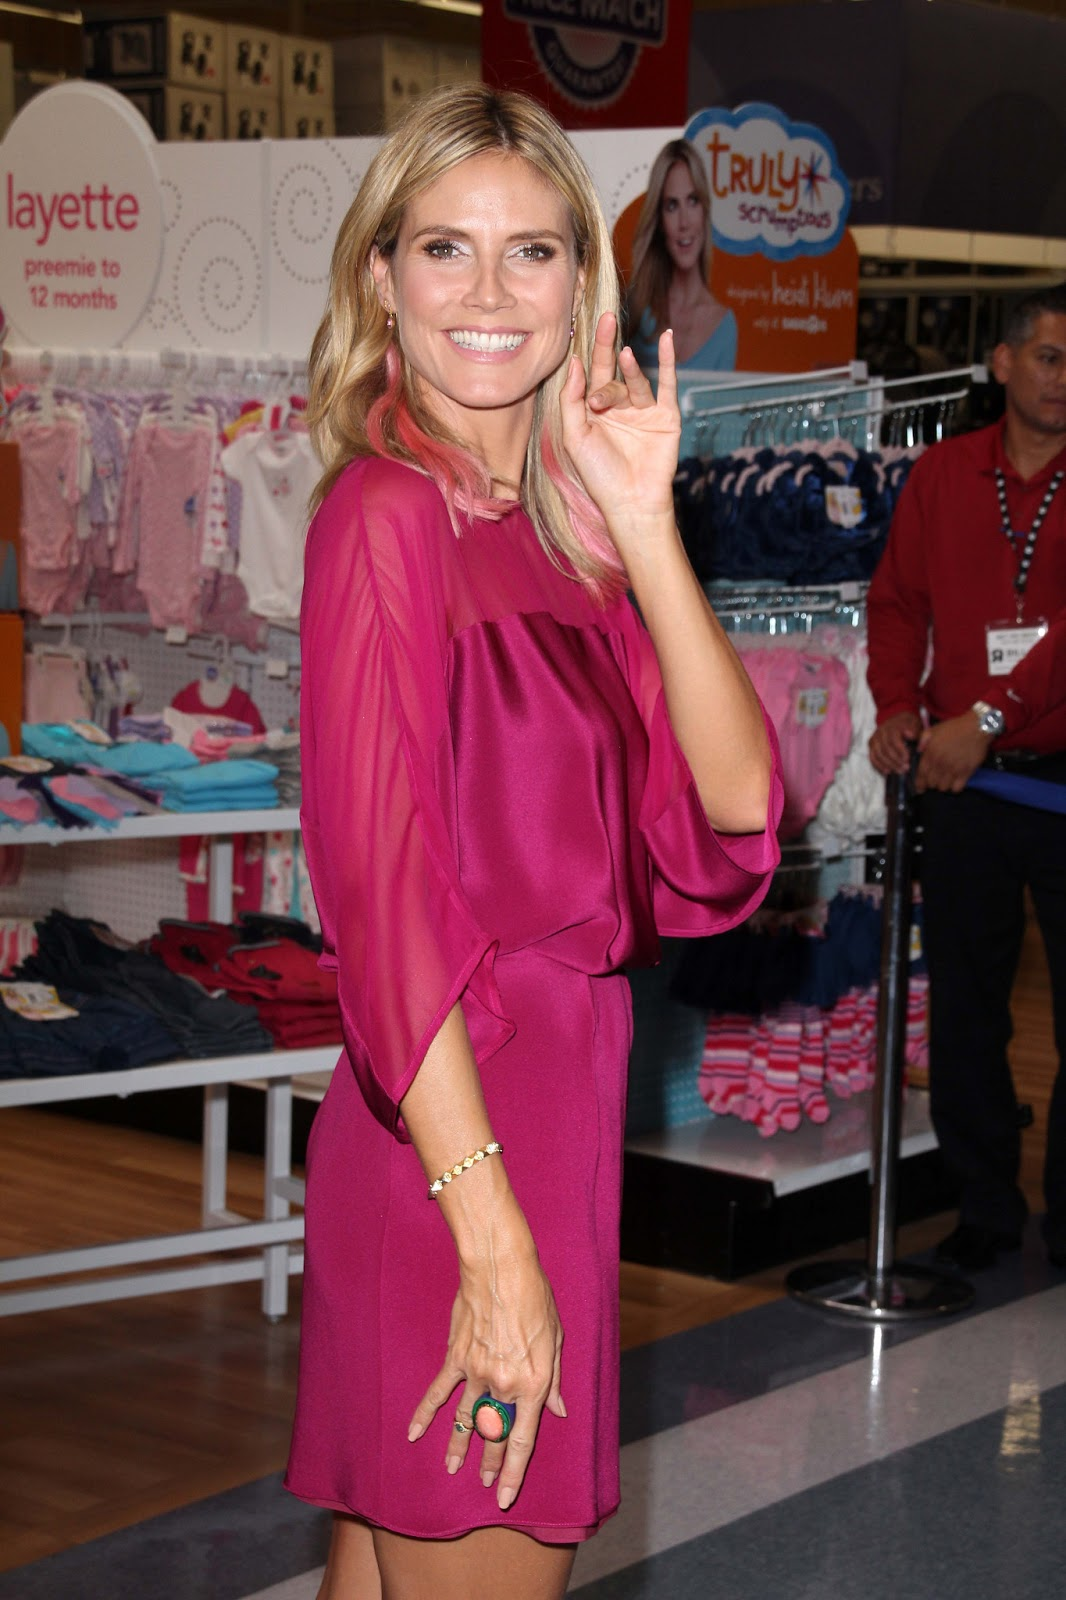 Heidi Klum Heidi Klum at Truly scrumptious Collection for